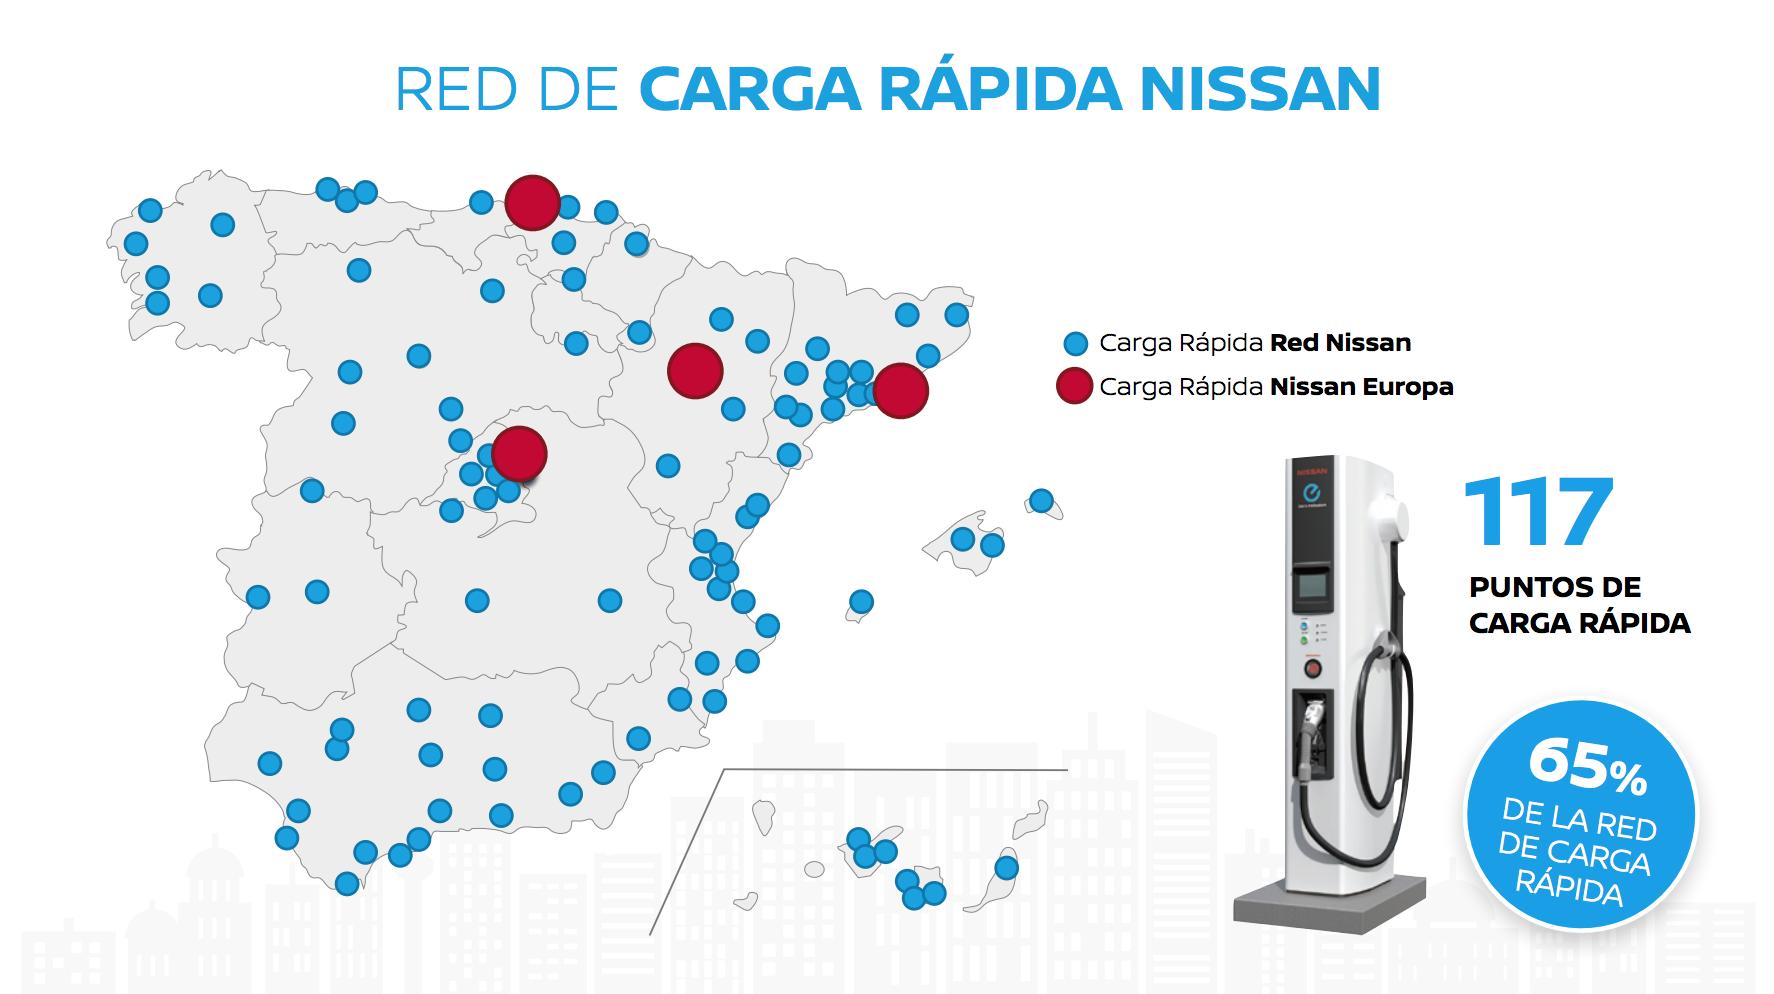 Red de carga rápida coches eléctricos de Nissan